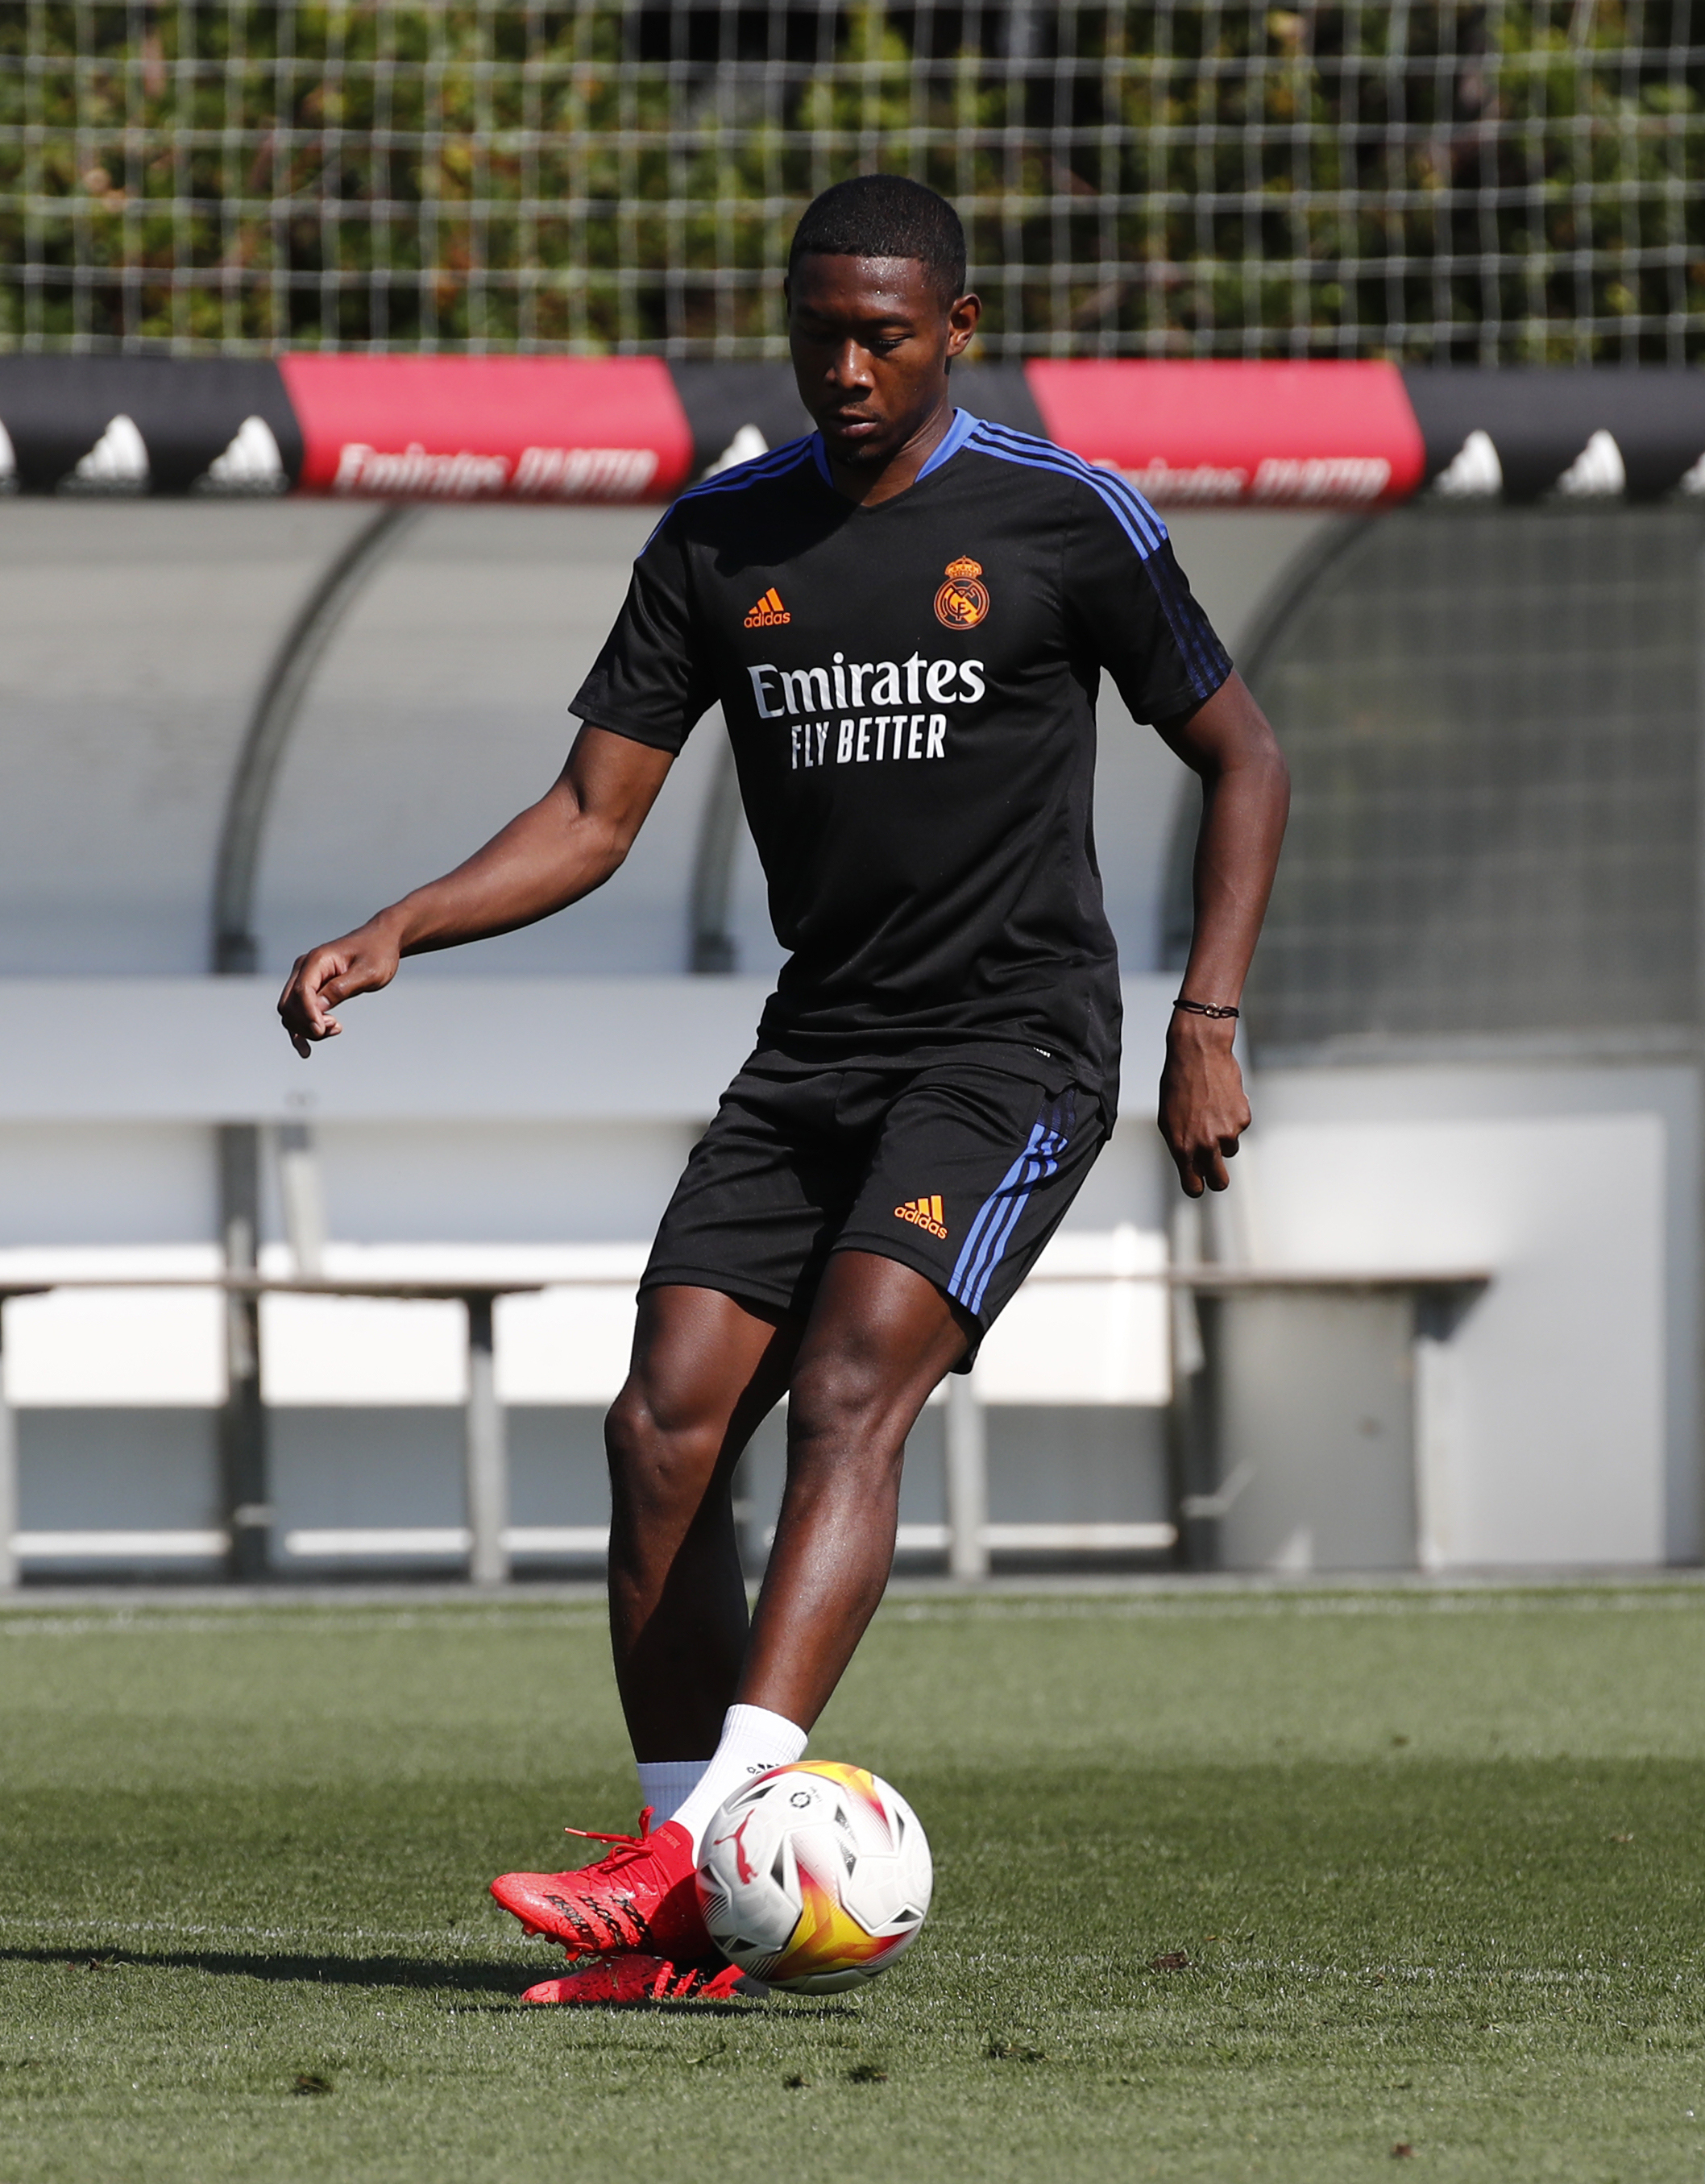 Real Madrid Pre-Season Training Session